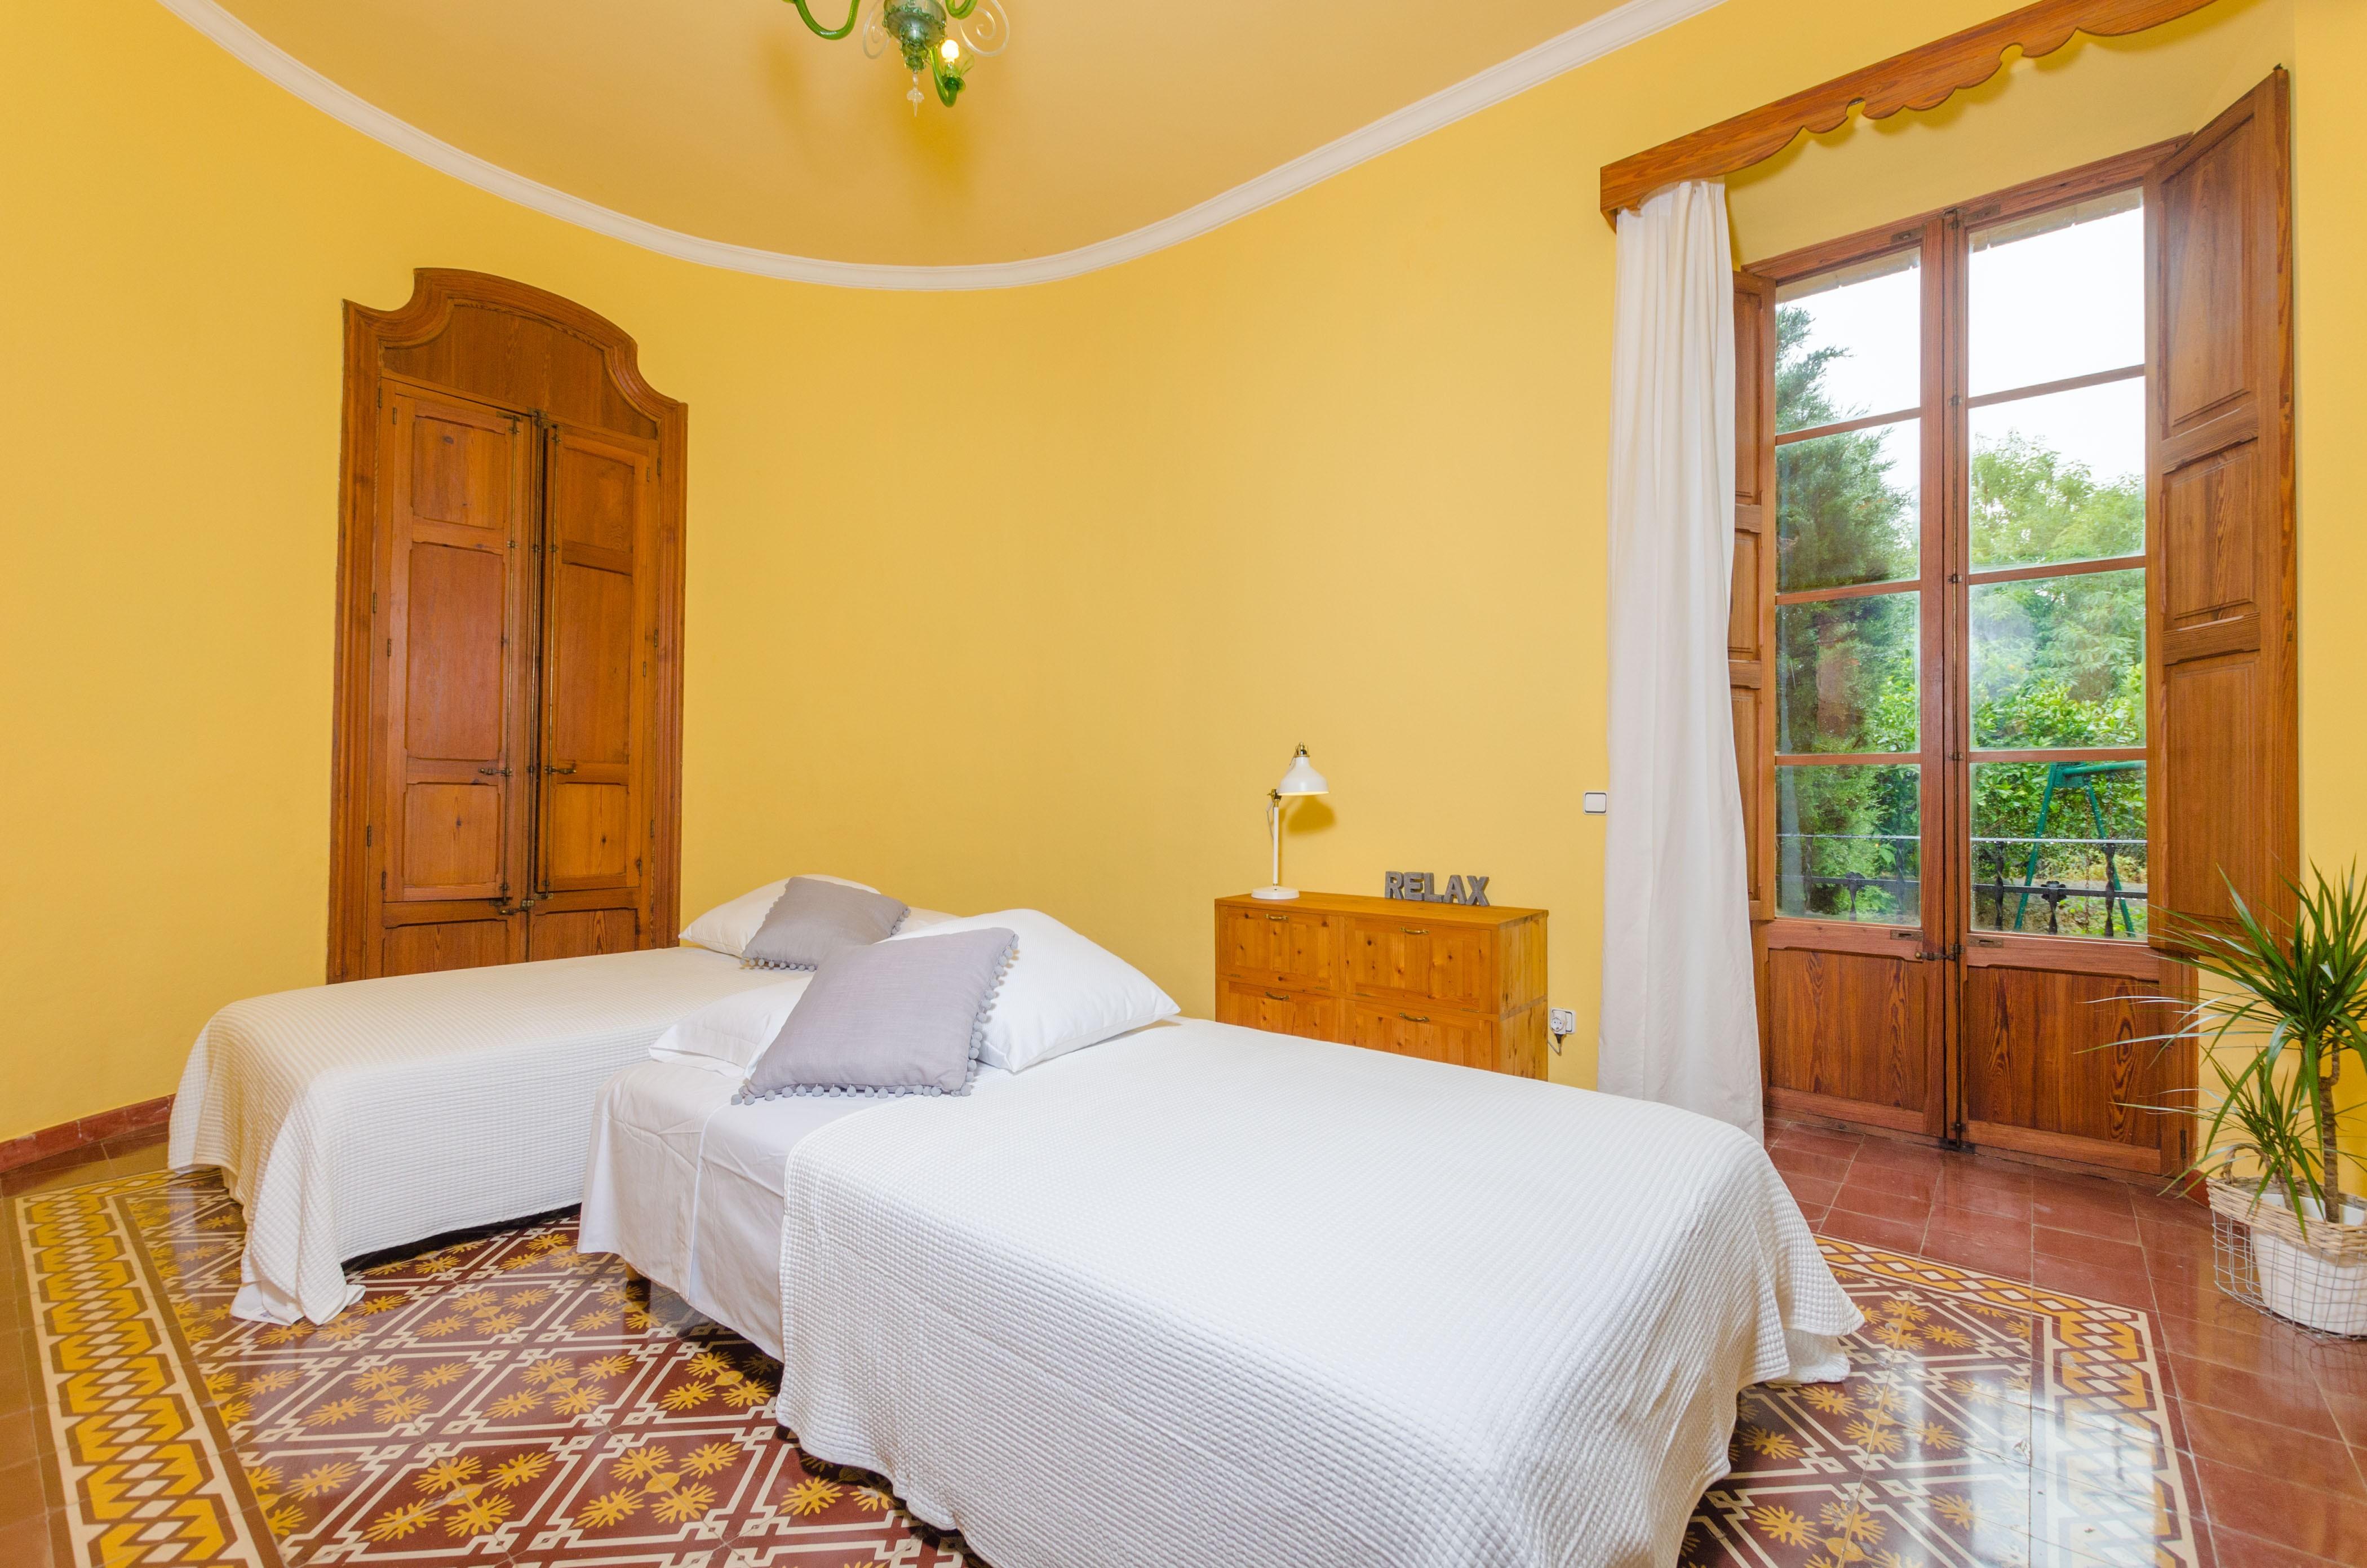 Maison de vacances CAS CONVIDATS (2435013), Alaro, Majorque, Iles Baléares, Espagne, image 24